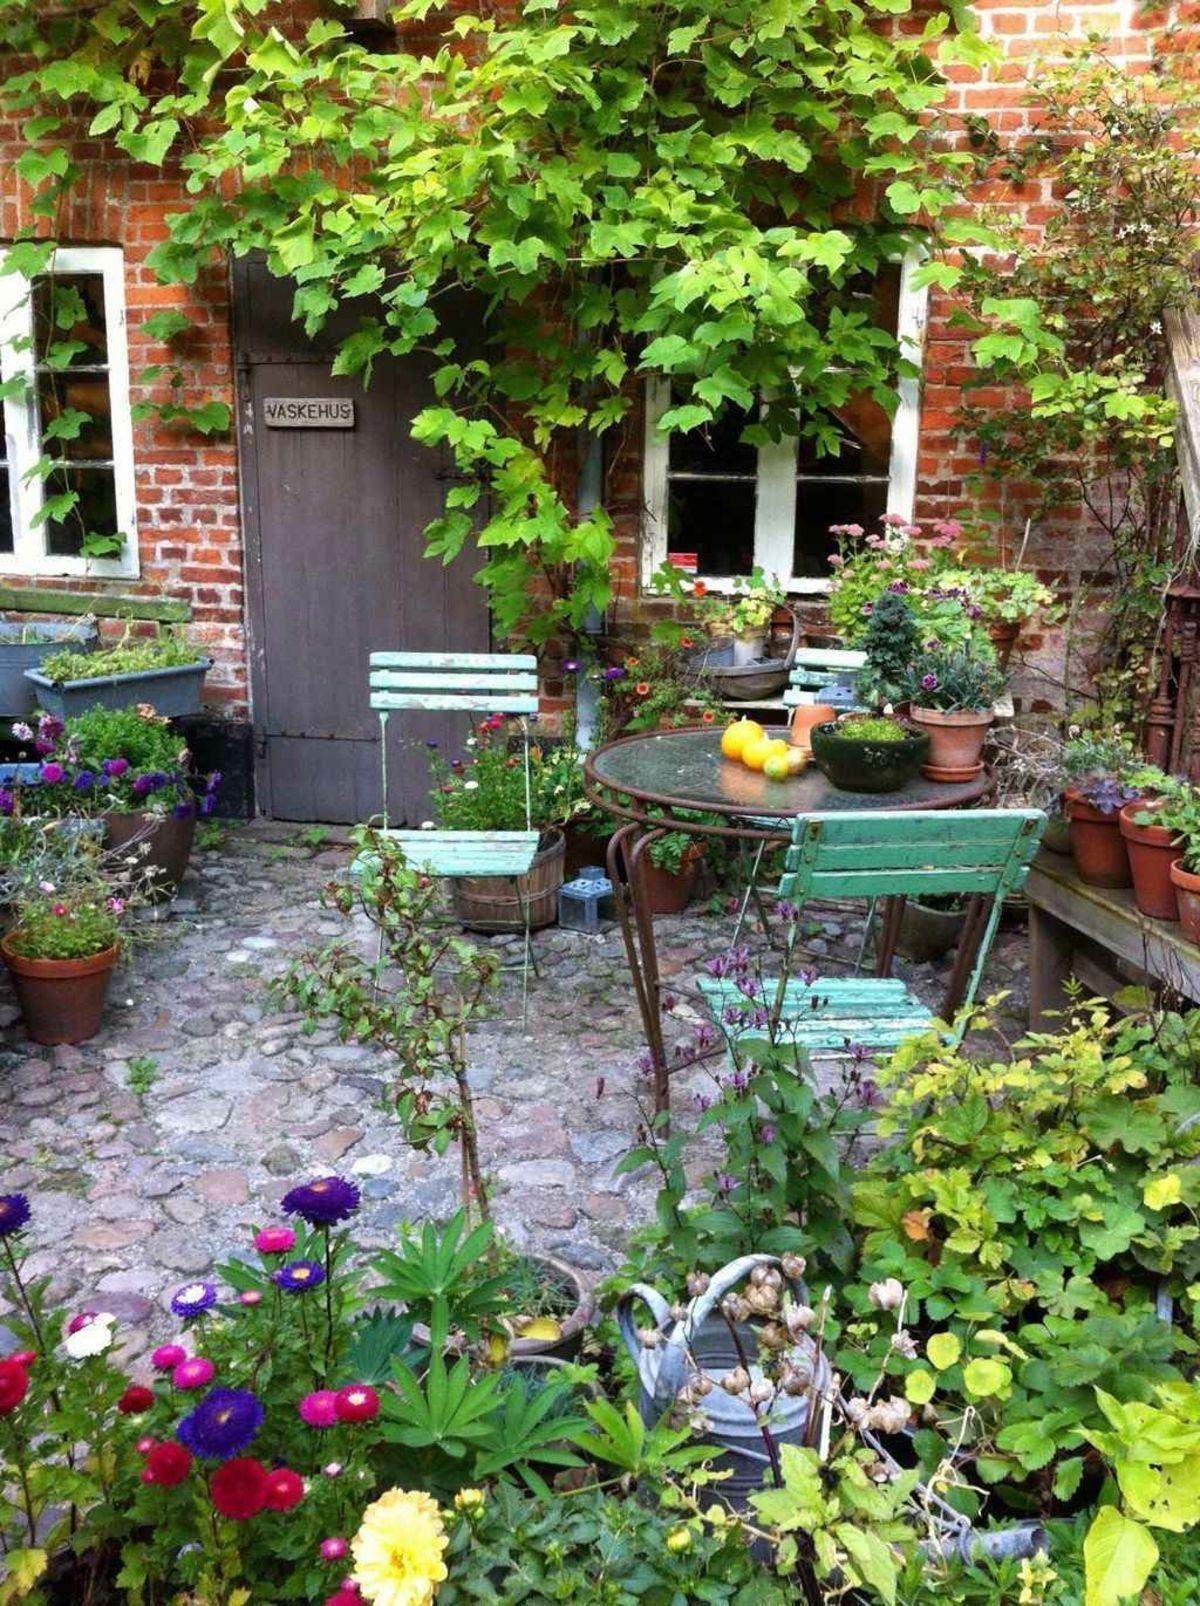 Small Terrace With Stone Flooring And Small Seating Area Small Terra Area Floori Small Cottage Garden Ideas Cottage Garden Design Backyard Garden Design